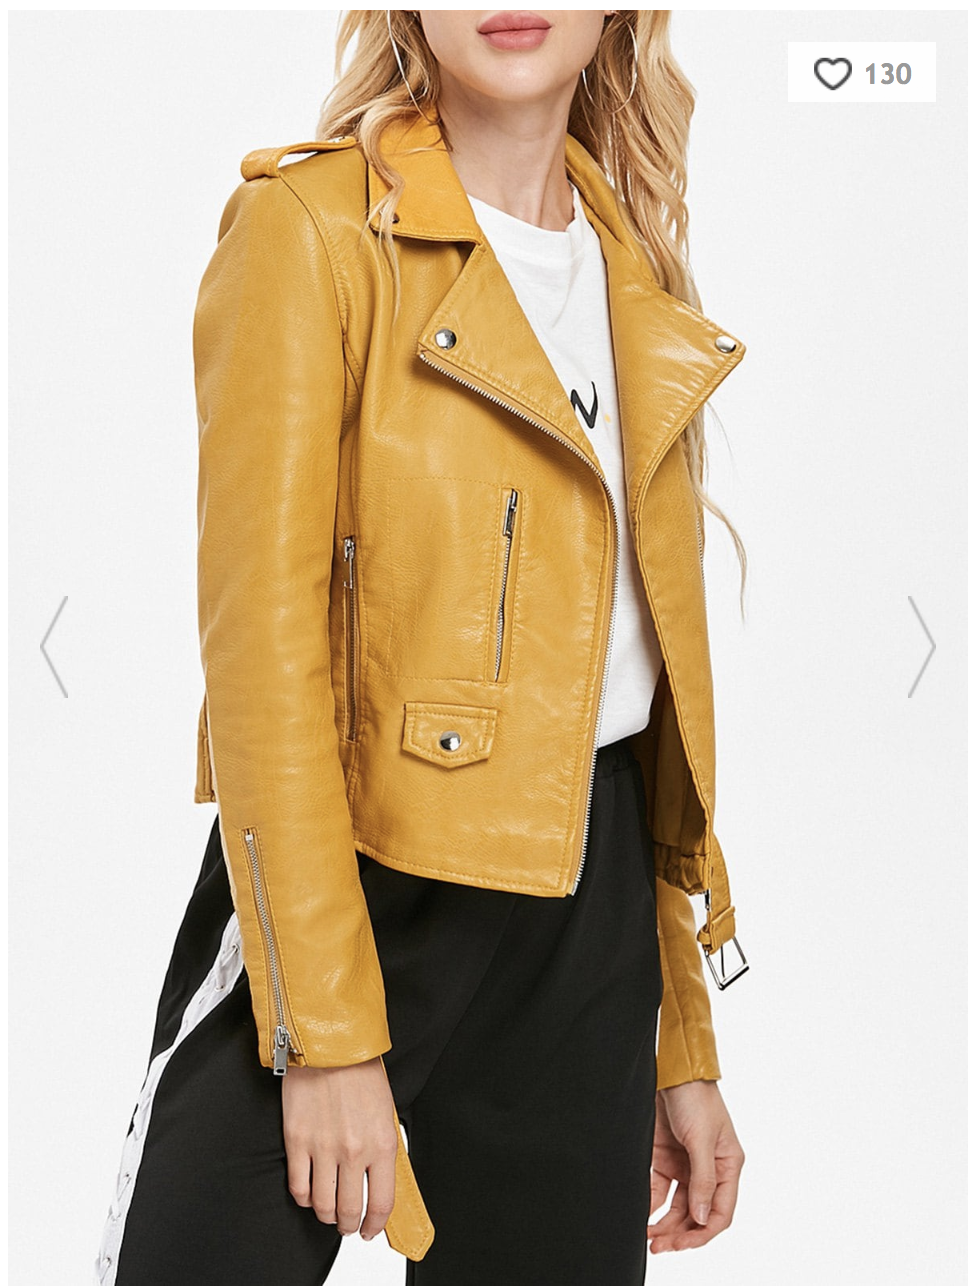 Yellow Biker Jacket, Bomber Jacket, Fall necessities, mustard jacket, Fall season